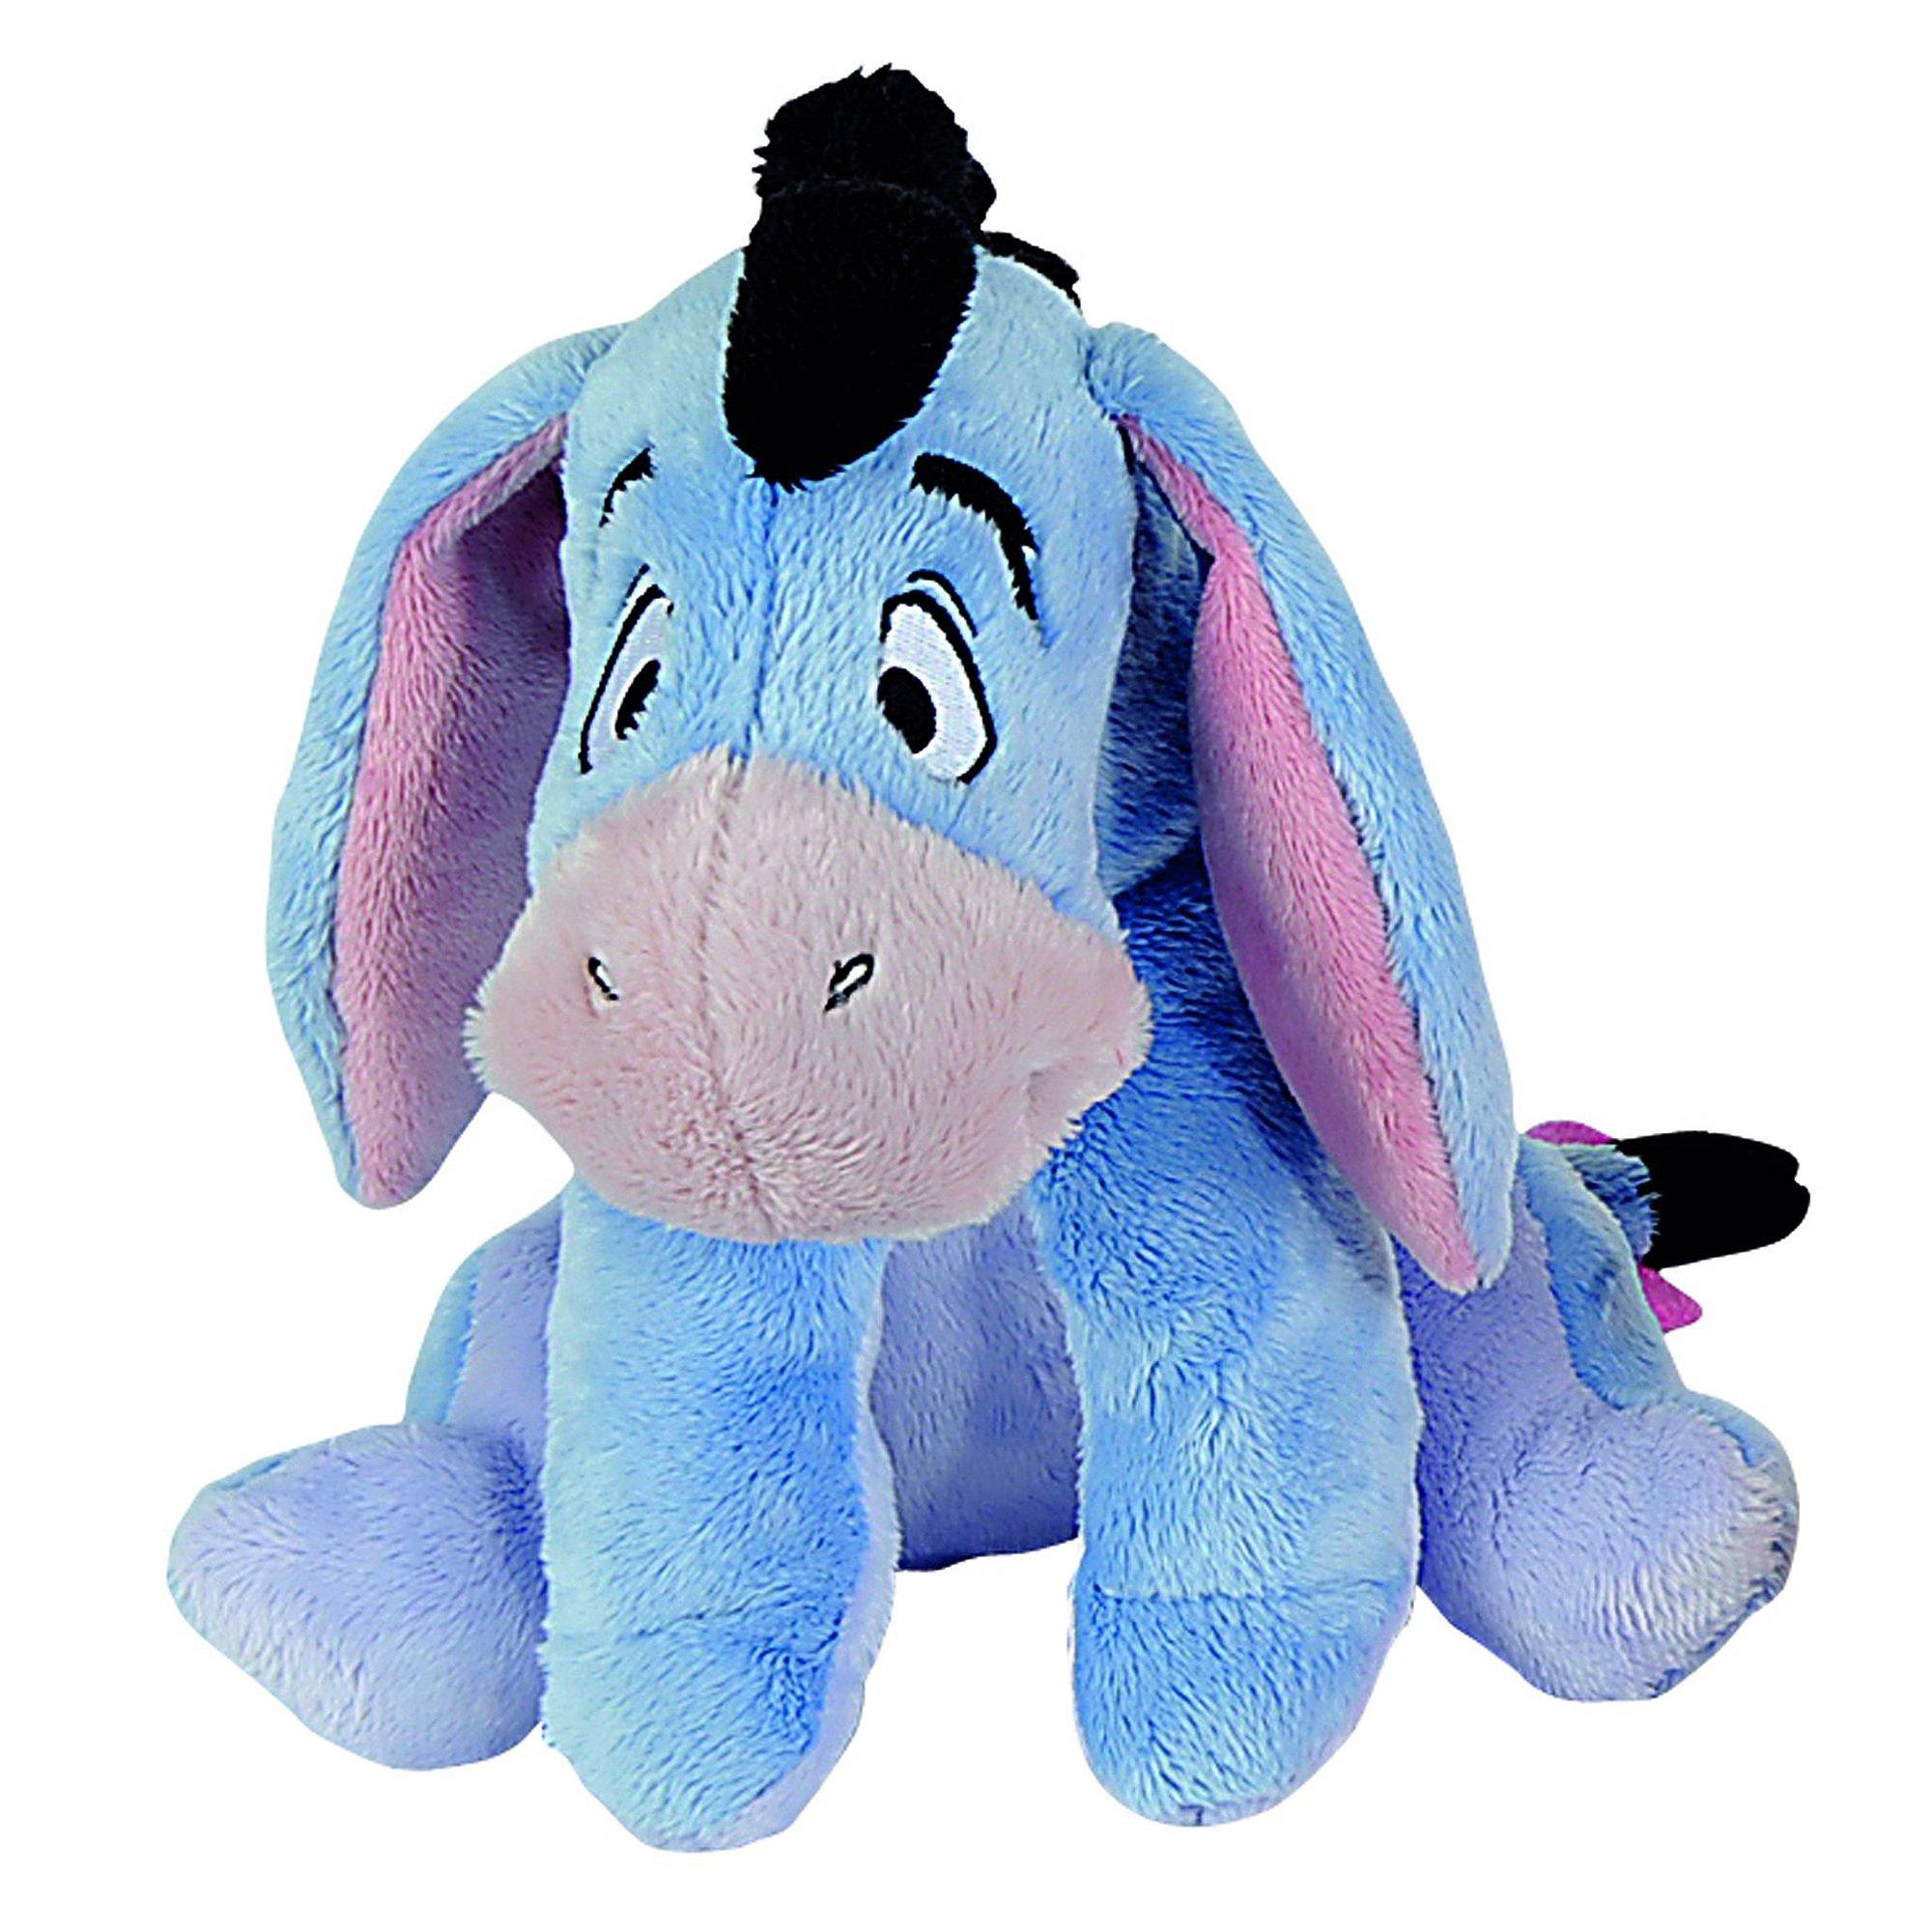 Мягкая игрушка  Ушастик, 25 см. - Мягкие игрушки Disney, артикул: 152231